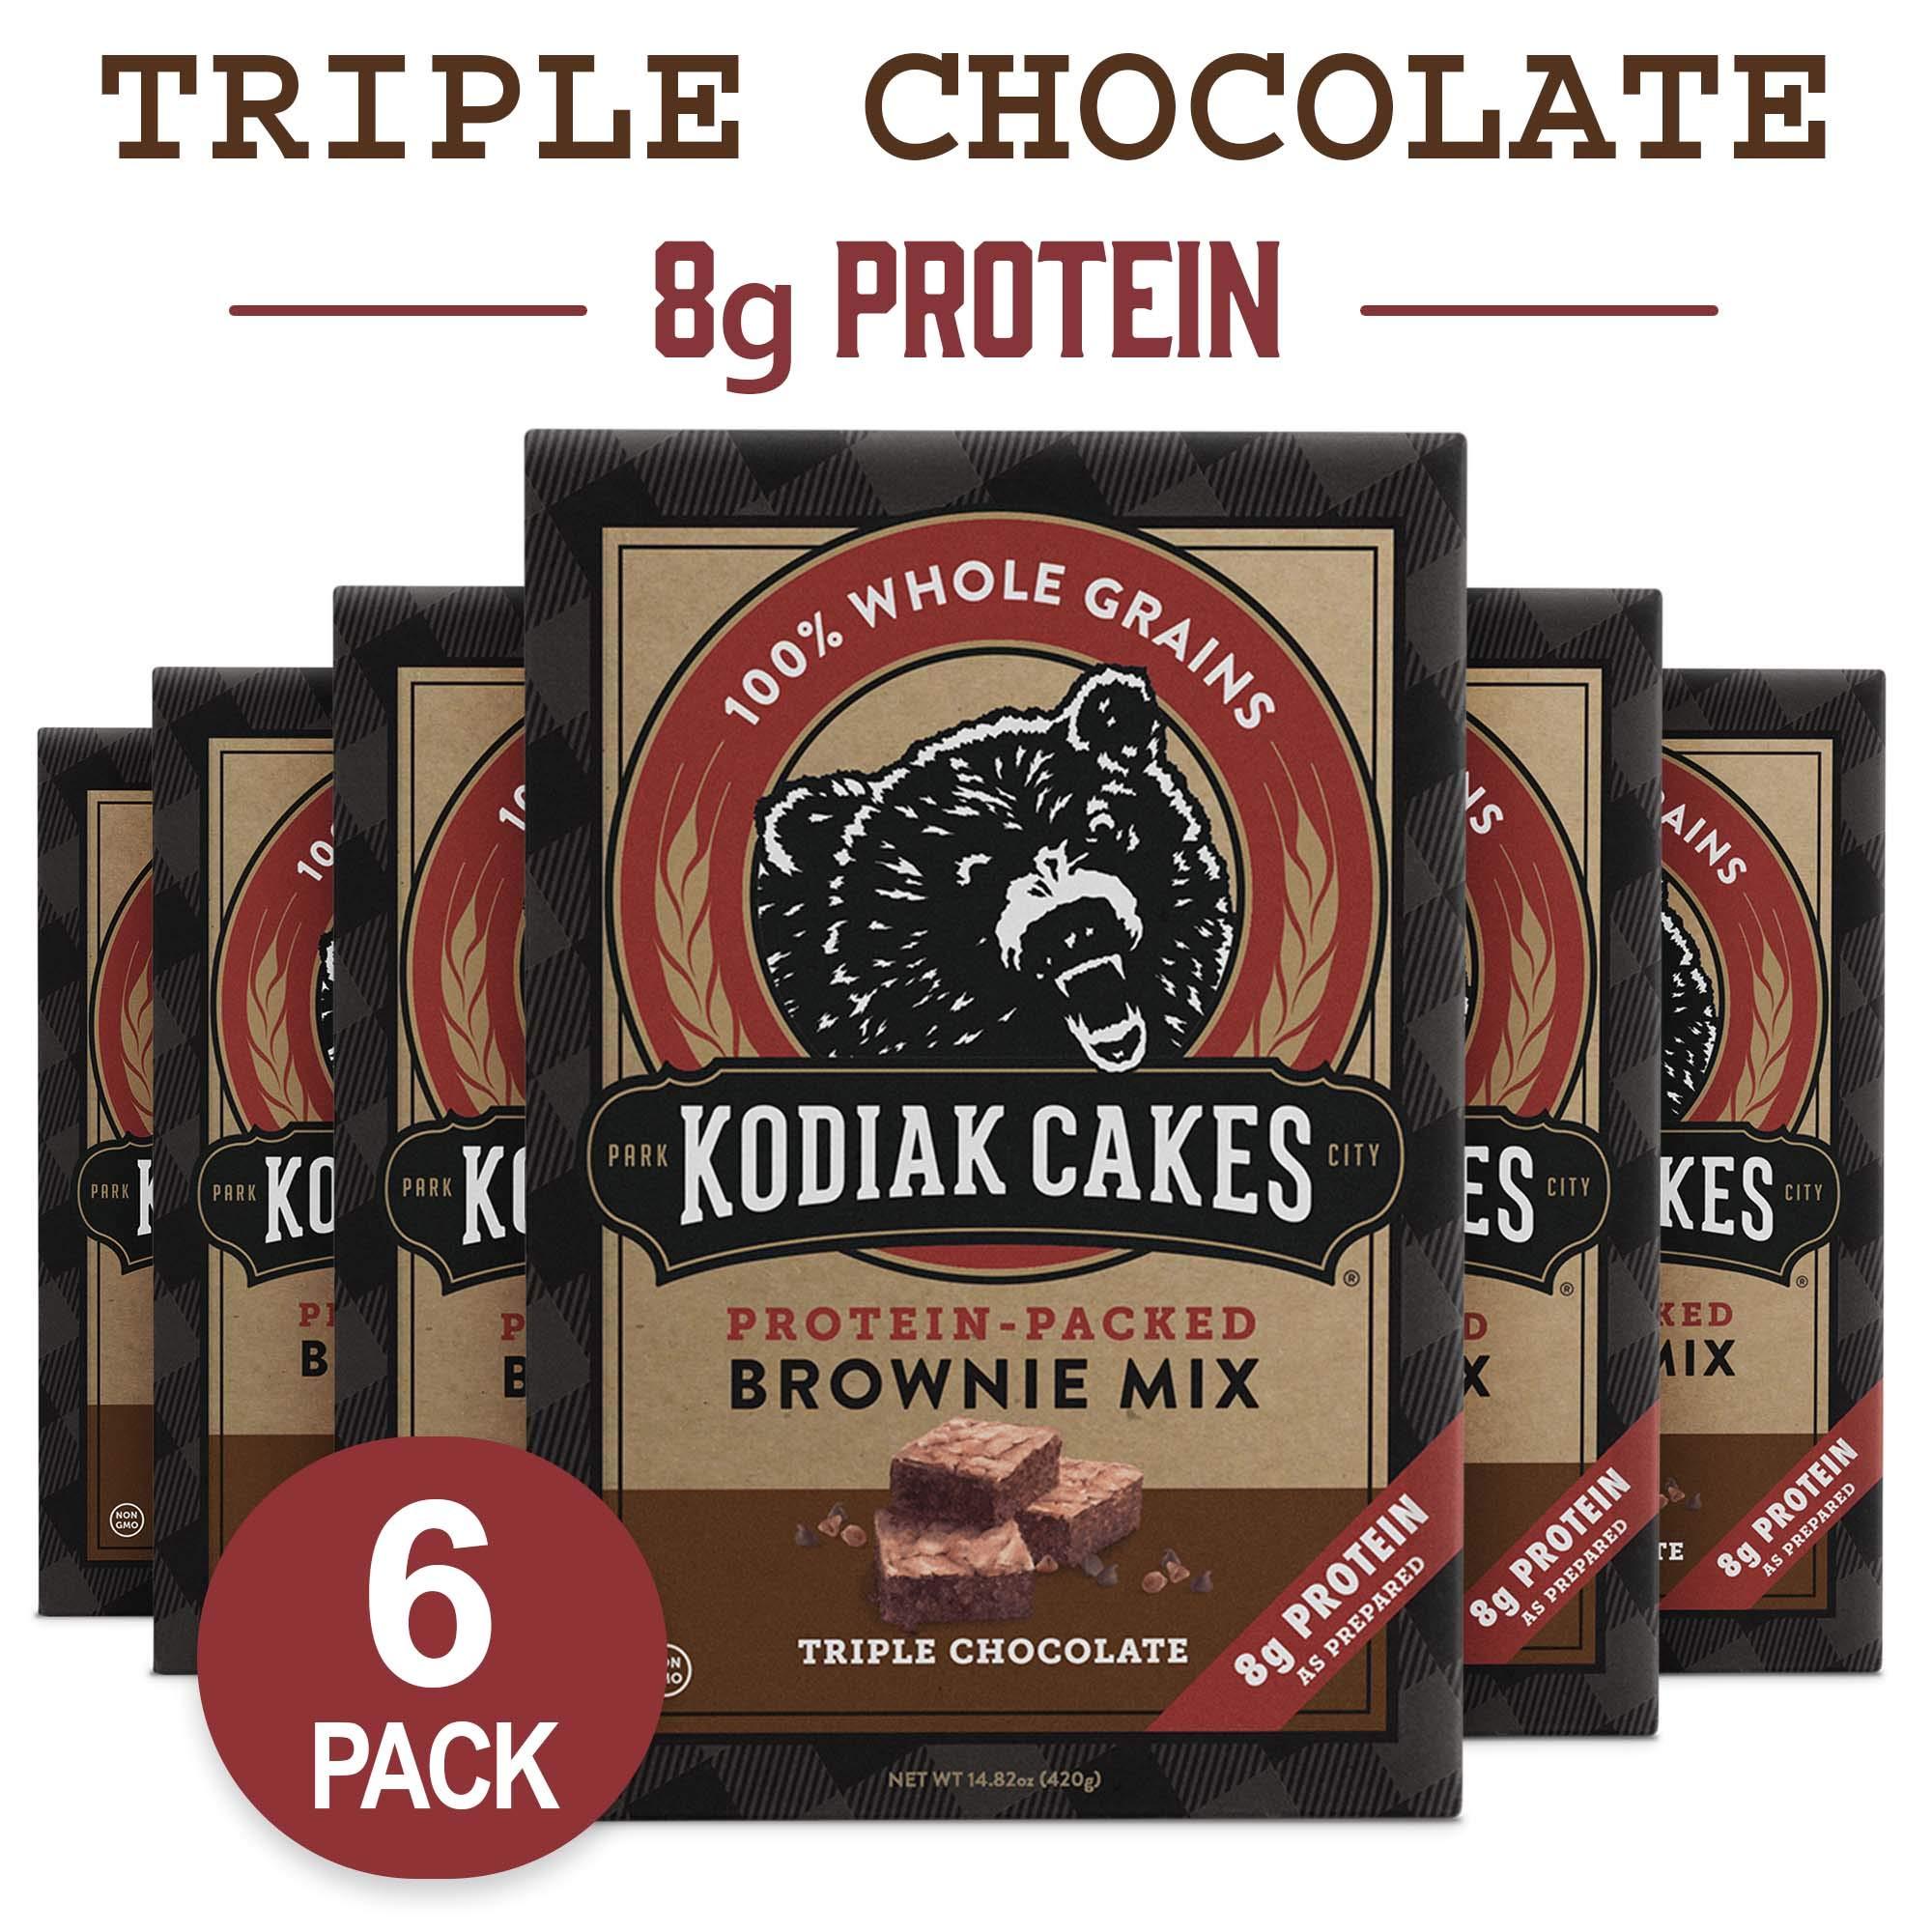 Kodiak Cakes Triple Chocolate Brownie Mix, 14.8 Ounce Boxes (Pack of 6) by Kodiak Cakes